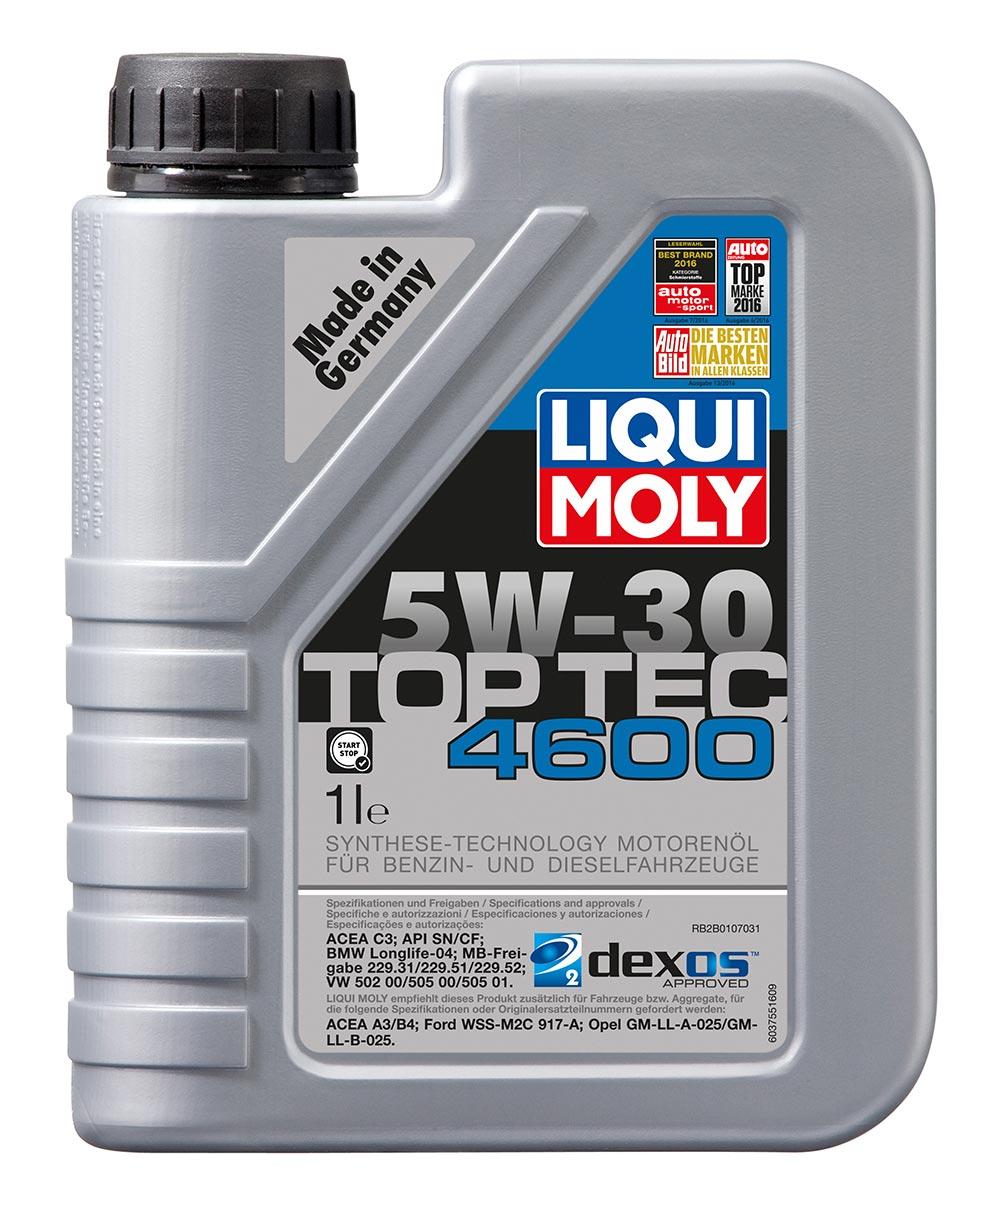 Масло моторное синт. 5W30 Top Tec 4600 1л ACEA C3 API SN API CF BMW Longlife-04